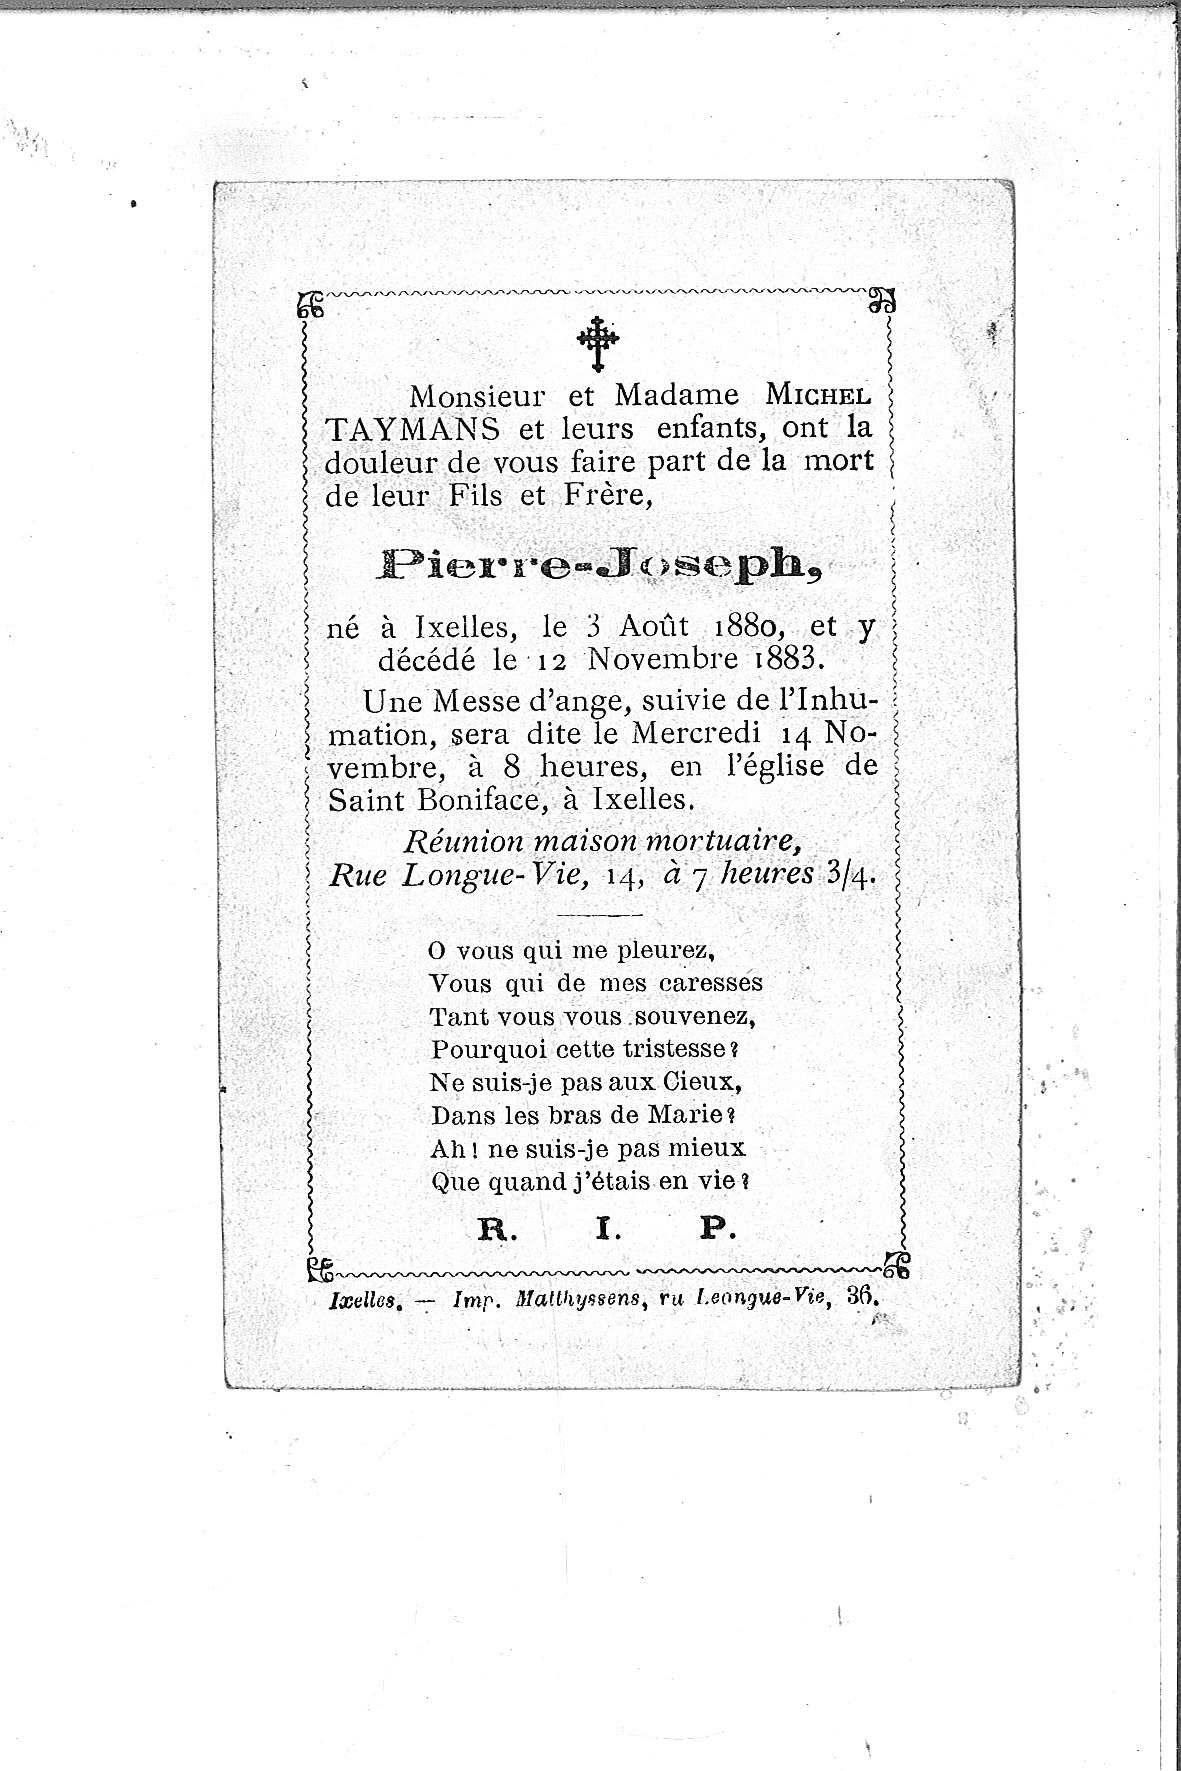 Pierre-Joseph(1883)20140730085017_00197.jpg